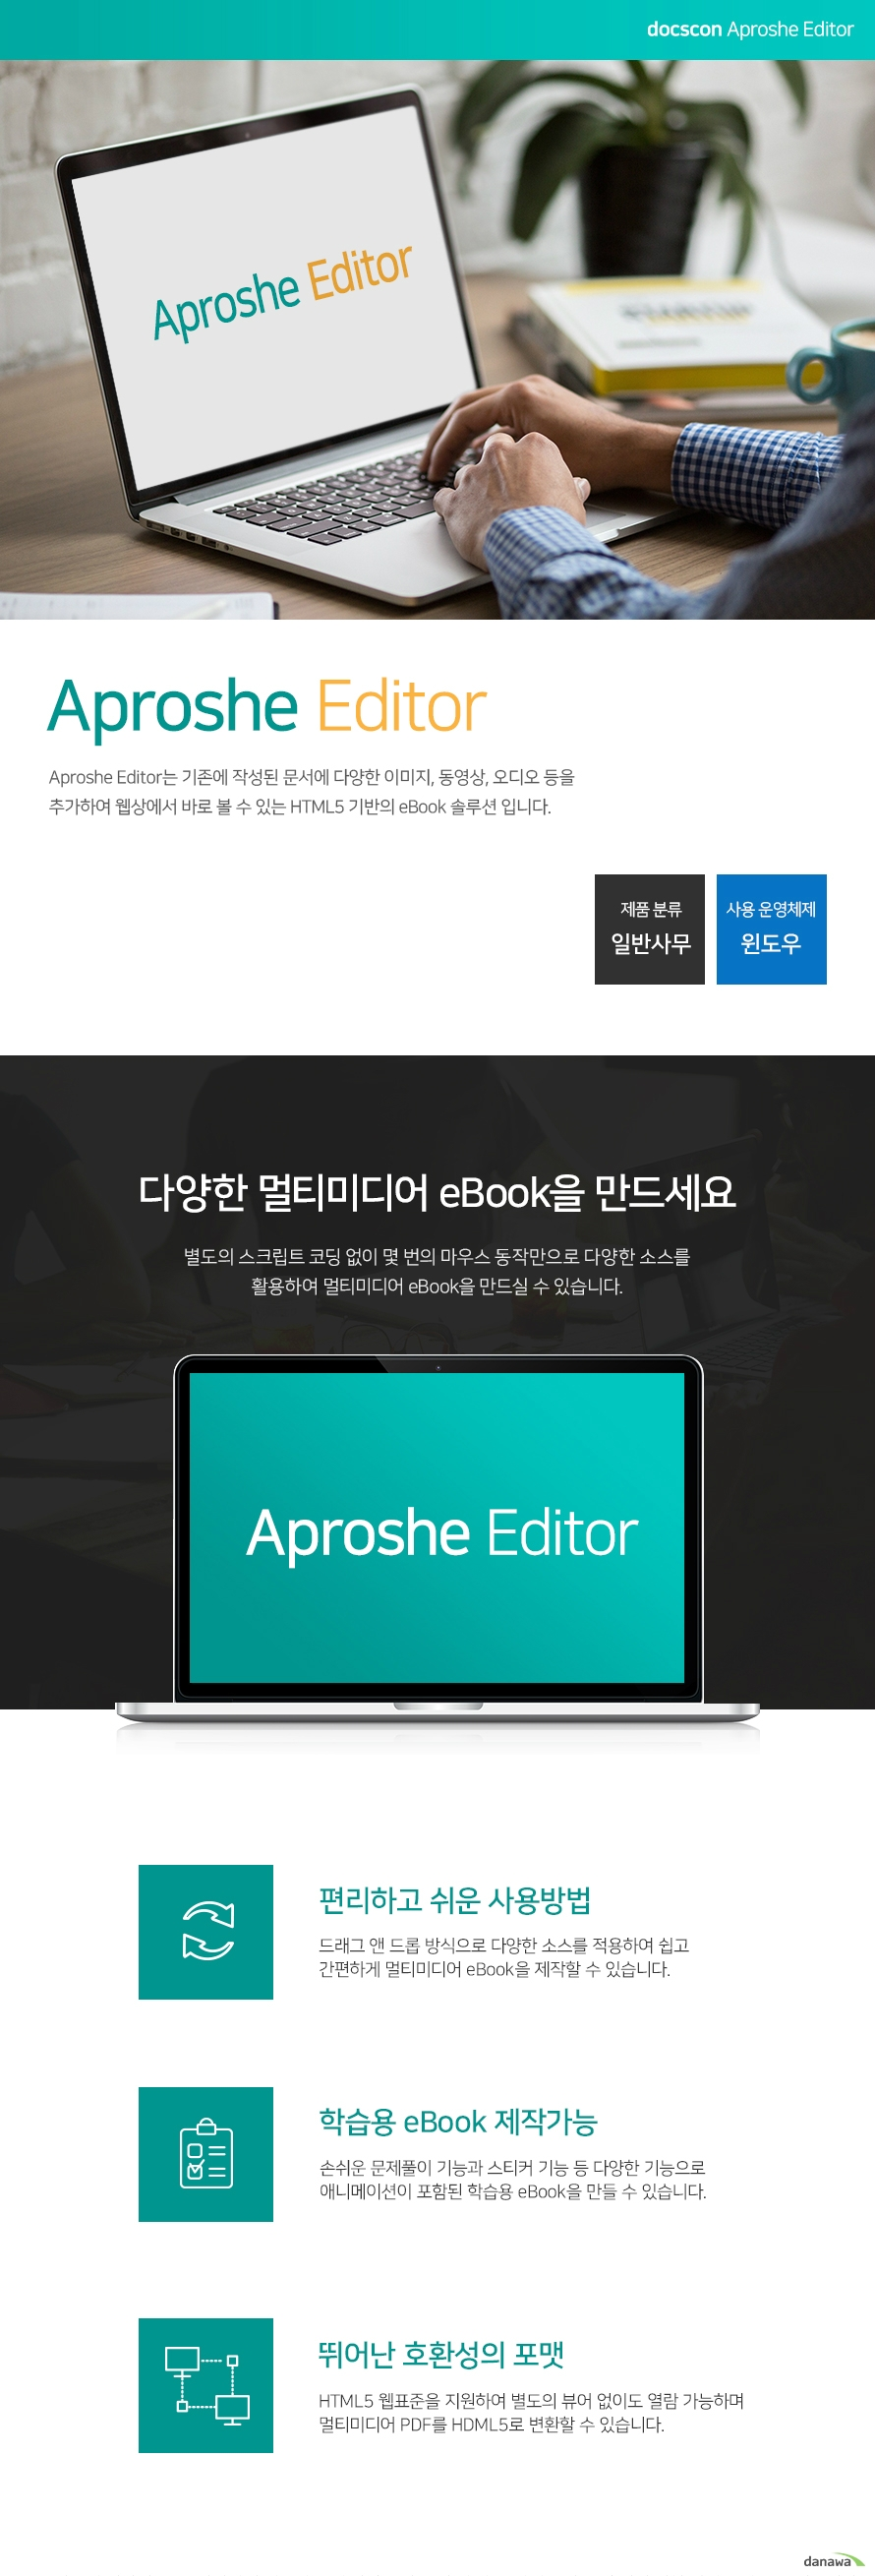 docscon  Aproshe Editor(라이선스)